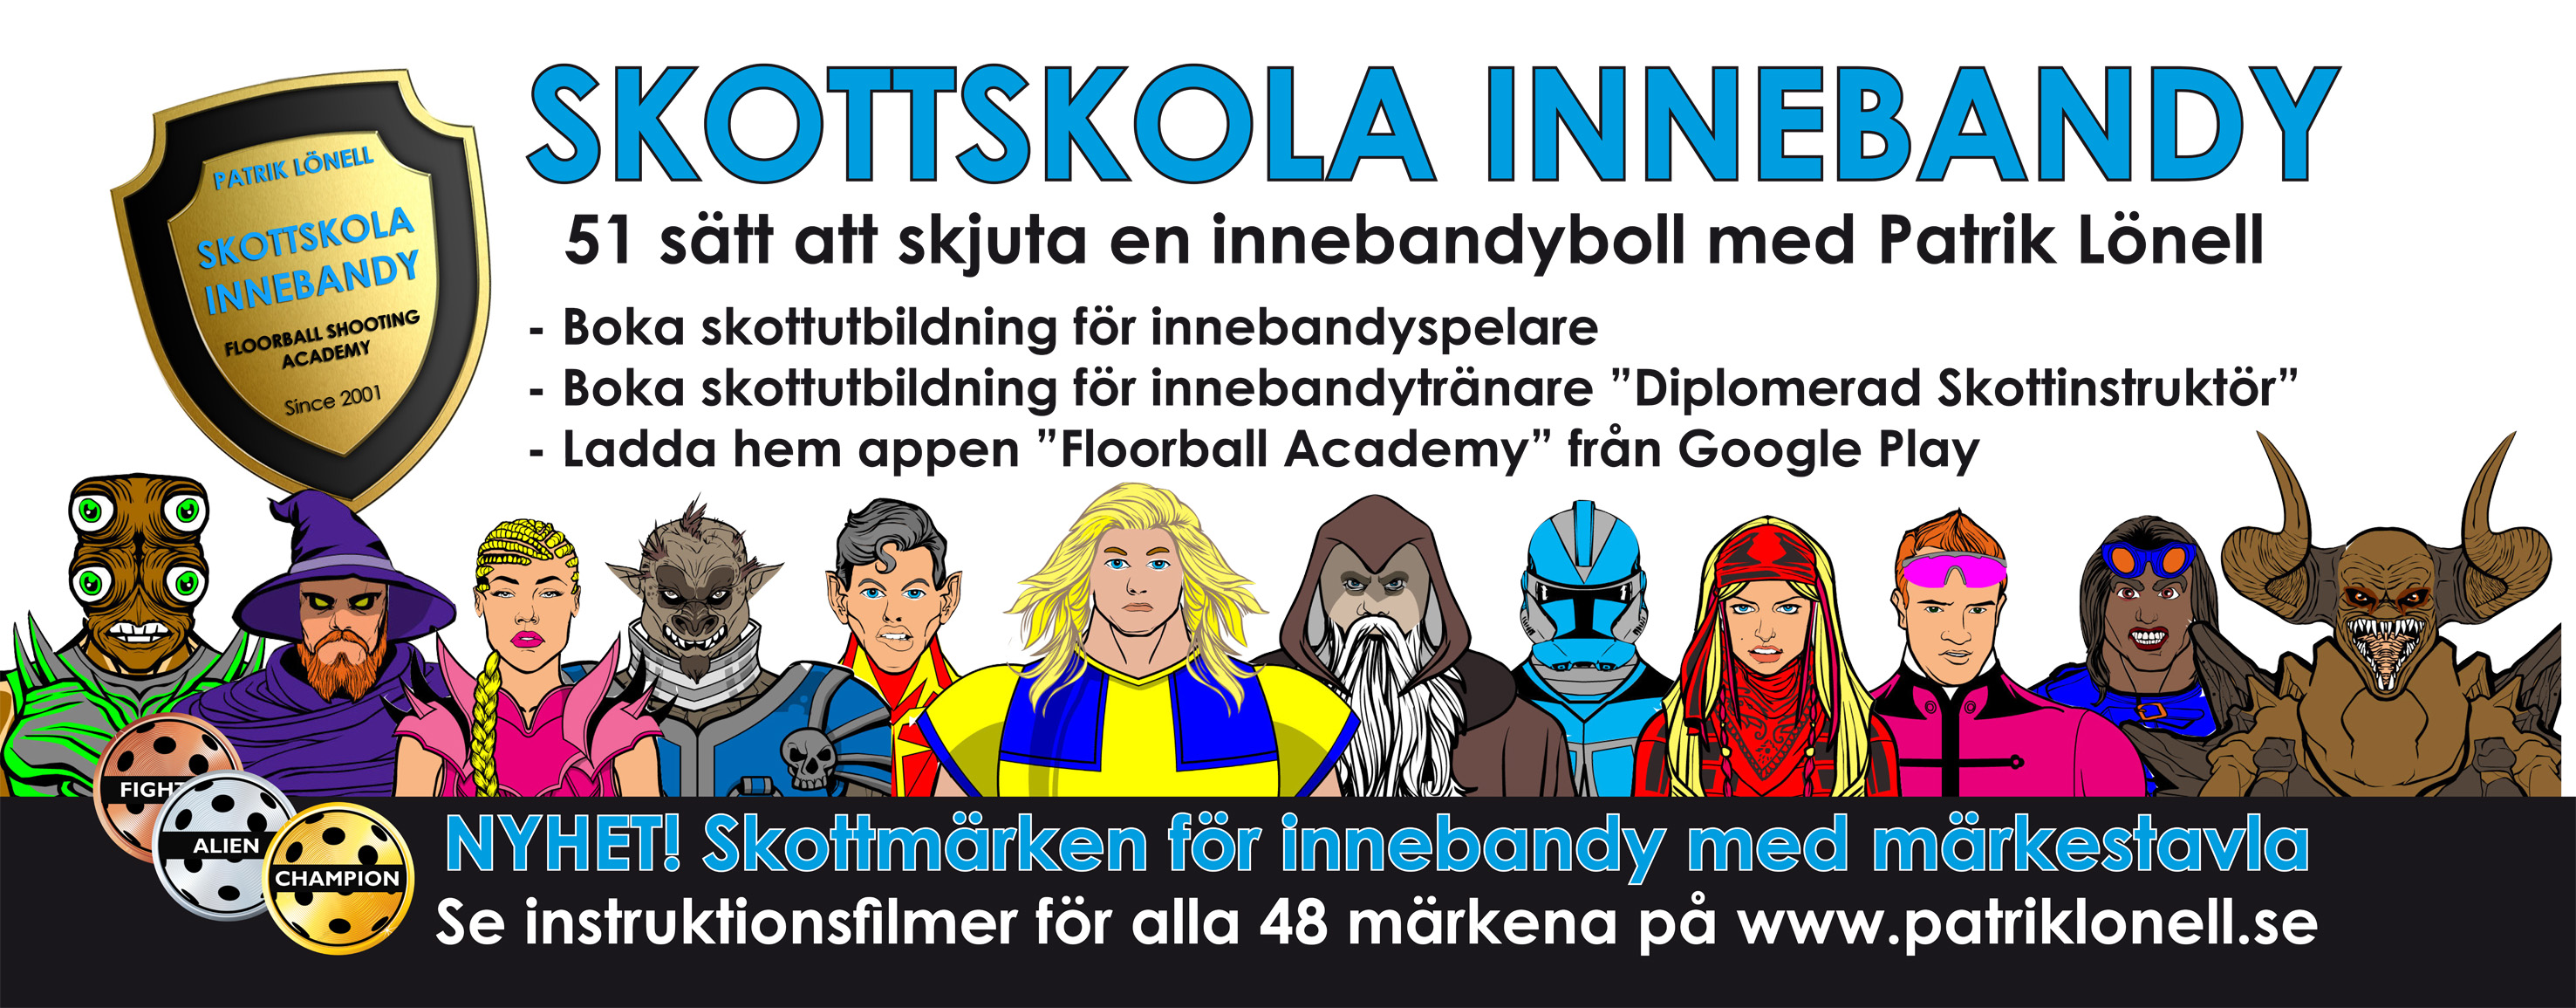 SKOTTSKOLA INNEBANDY PATRIK LÖNELL